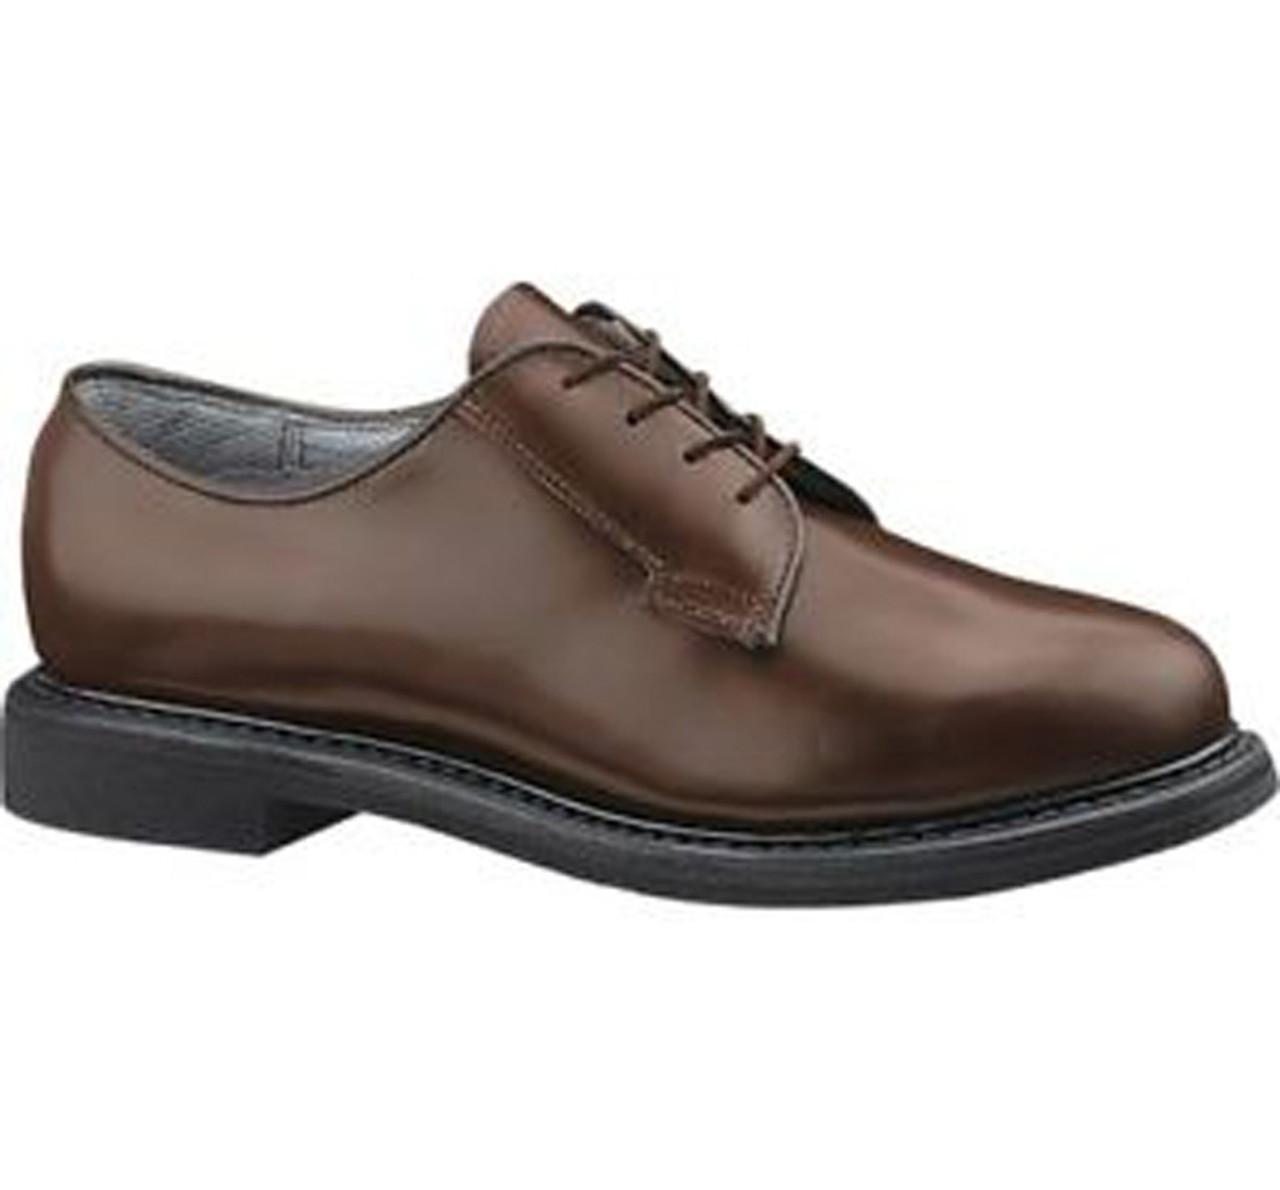 Bates 82-B Mens Lites Brown Leather Uniform Oxford Shoe FAST FREE USA SHIPPING